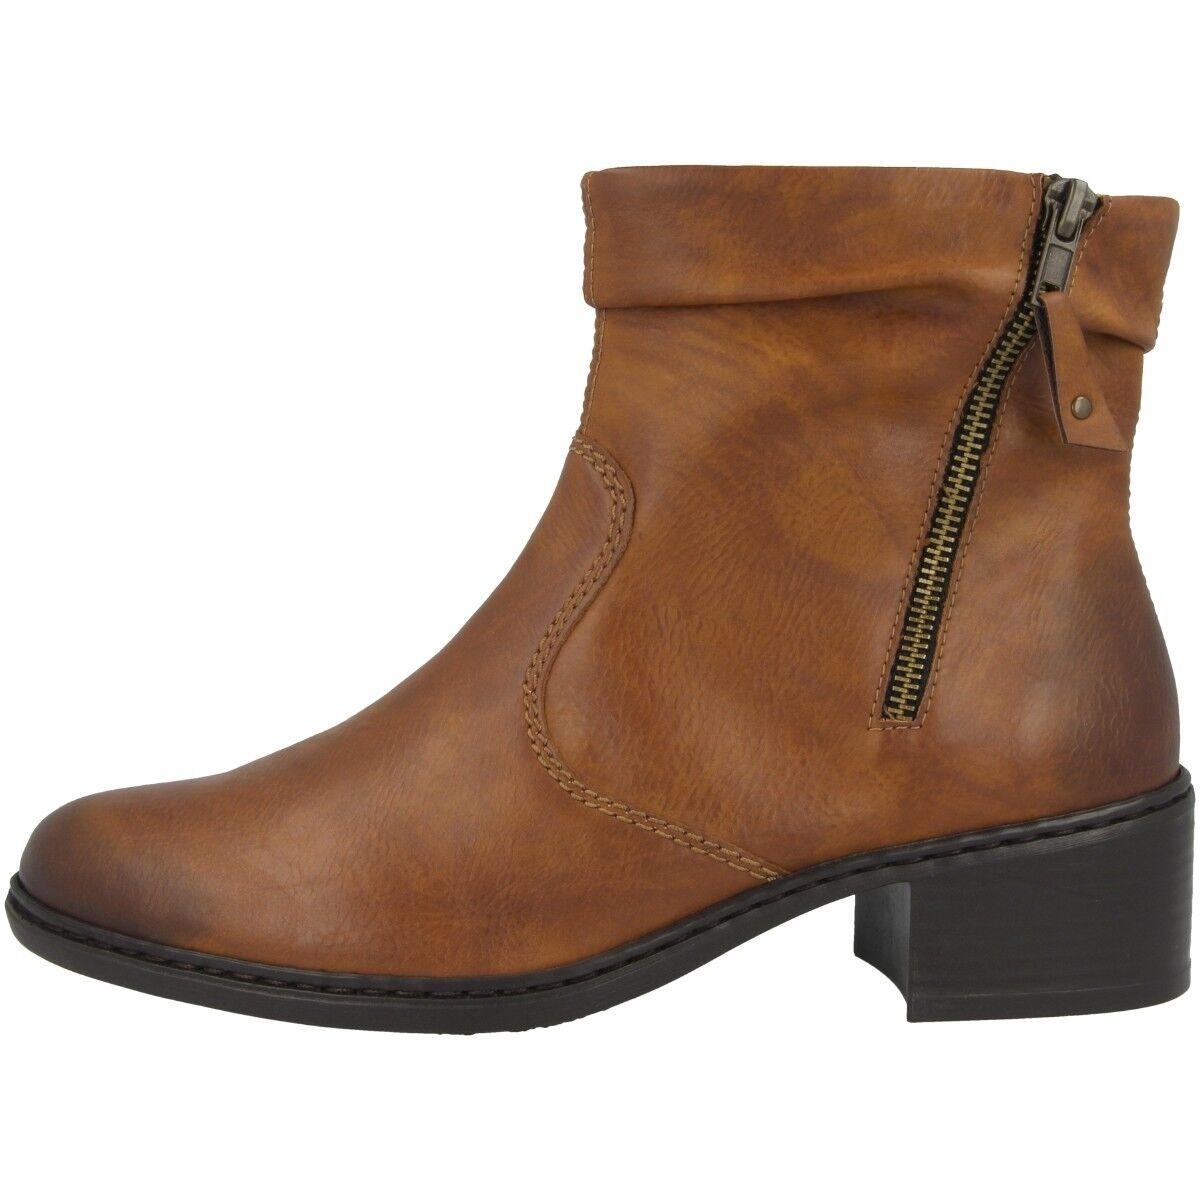 Rieker antistress women eagle shoes women boots brown booties 77672-24